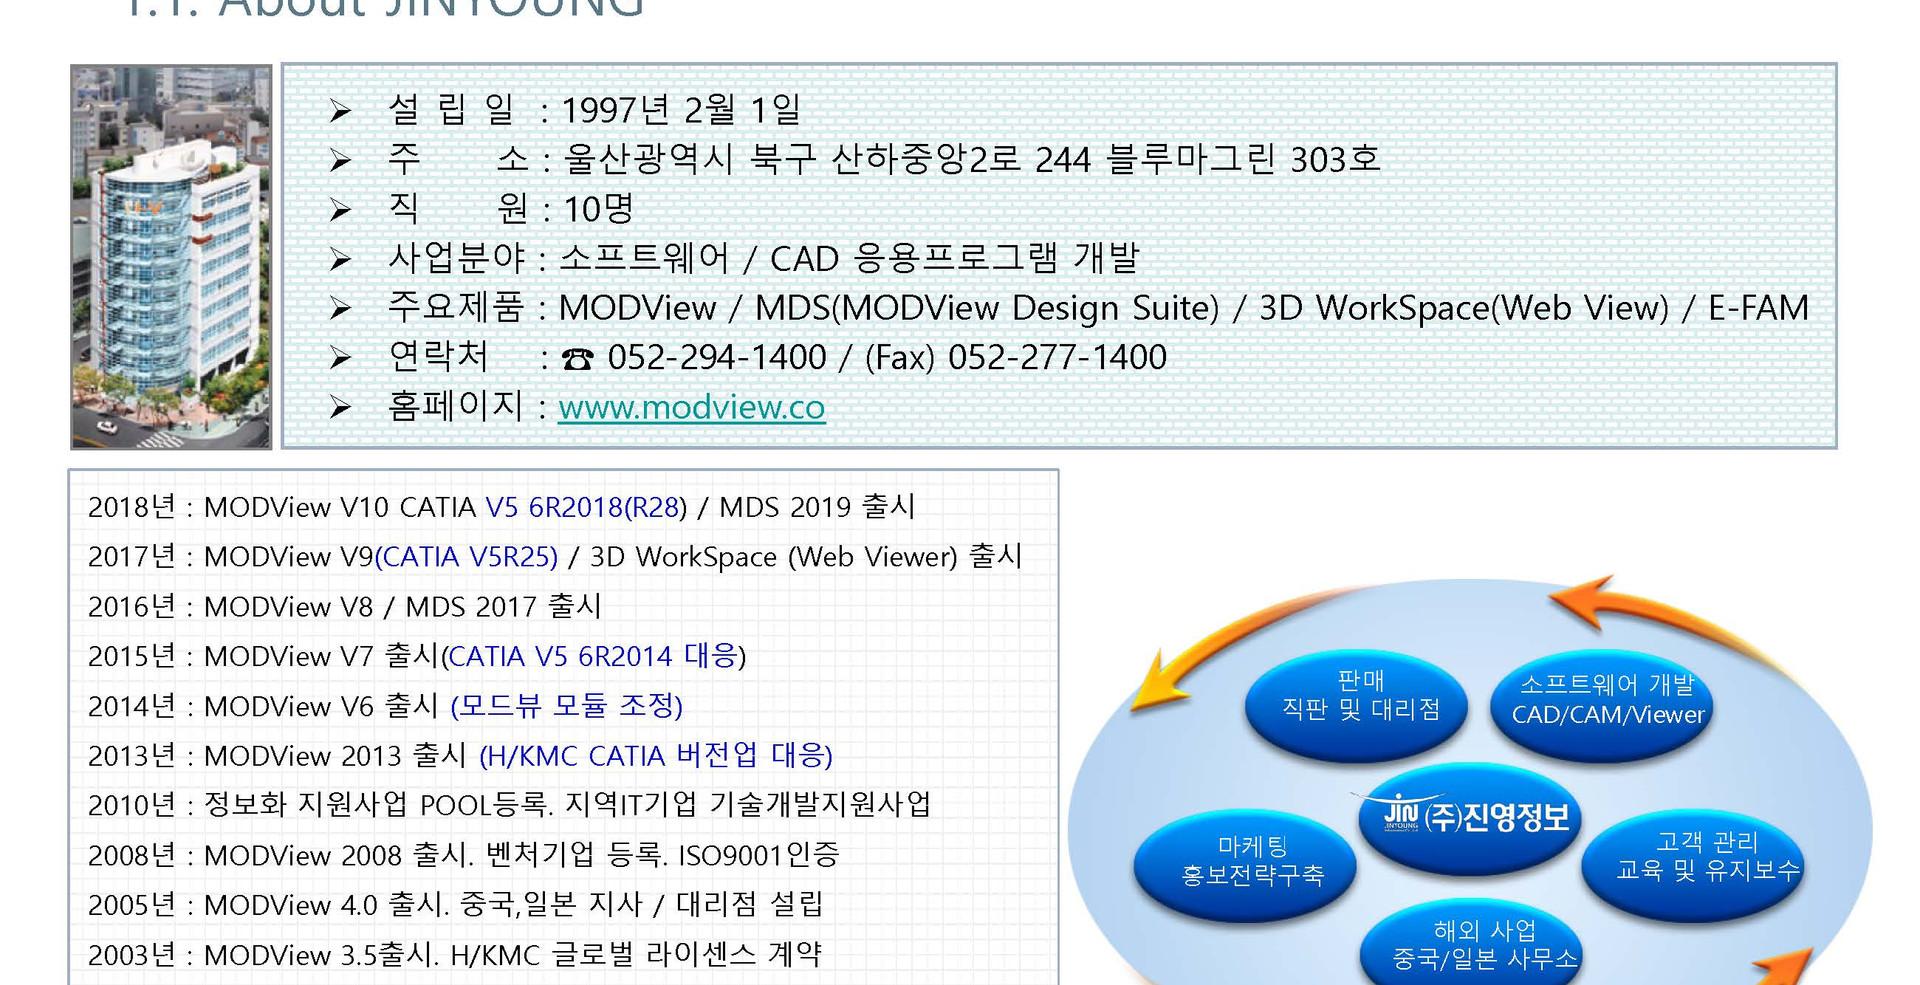 MODView_제안서_Jinyoung_2018_페이지_03.jpg